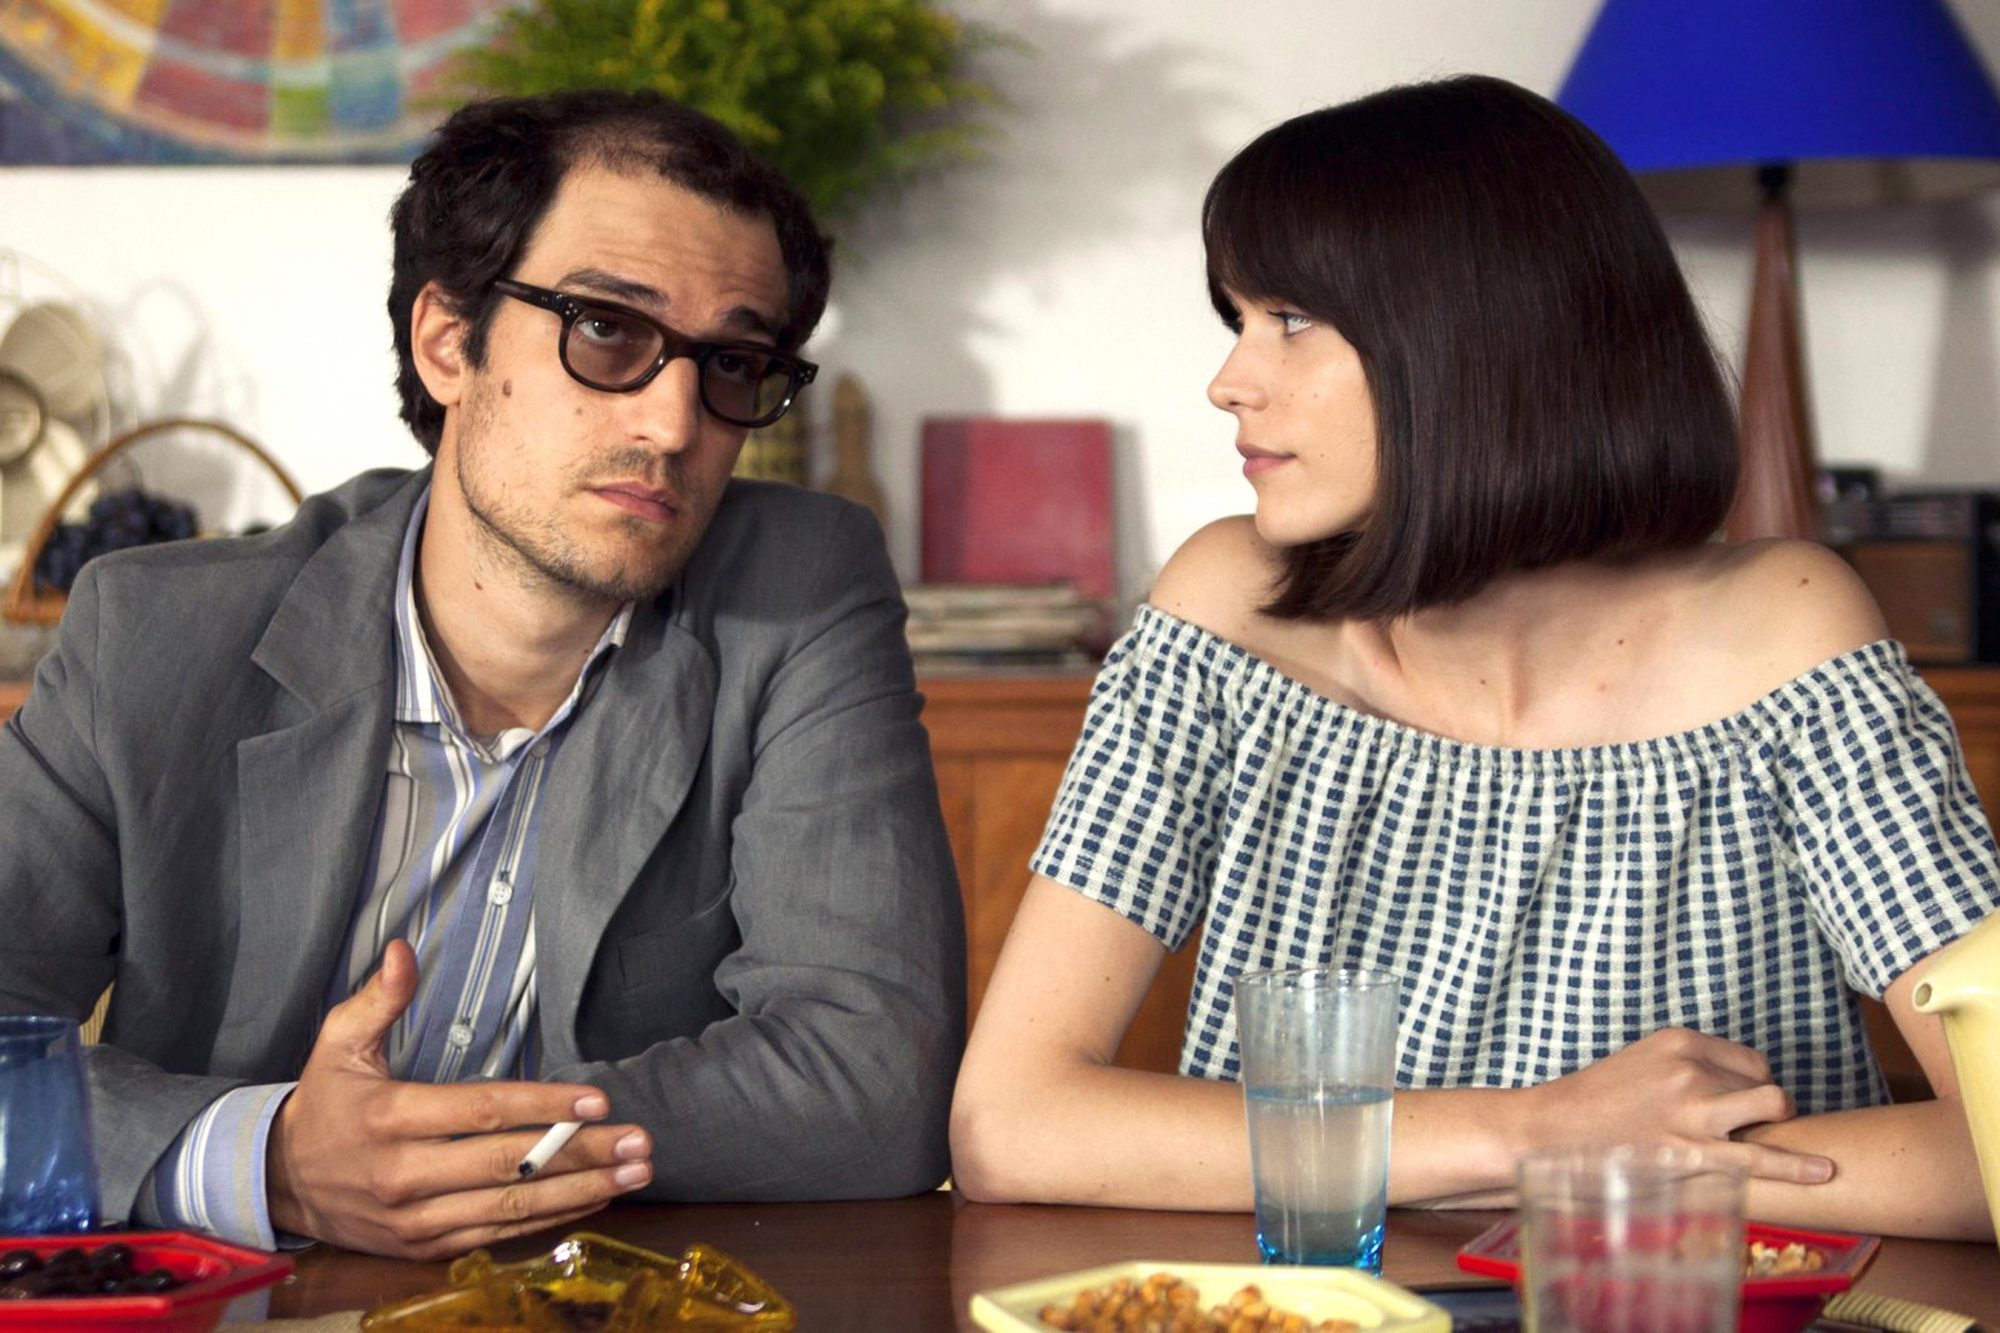 Godard Mon Amour (2018)Louis Garrel and Stacy MartinCR: Cohen Media Group